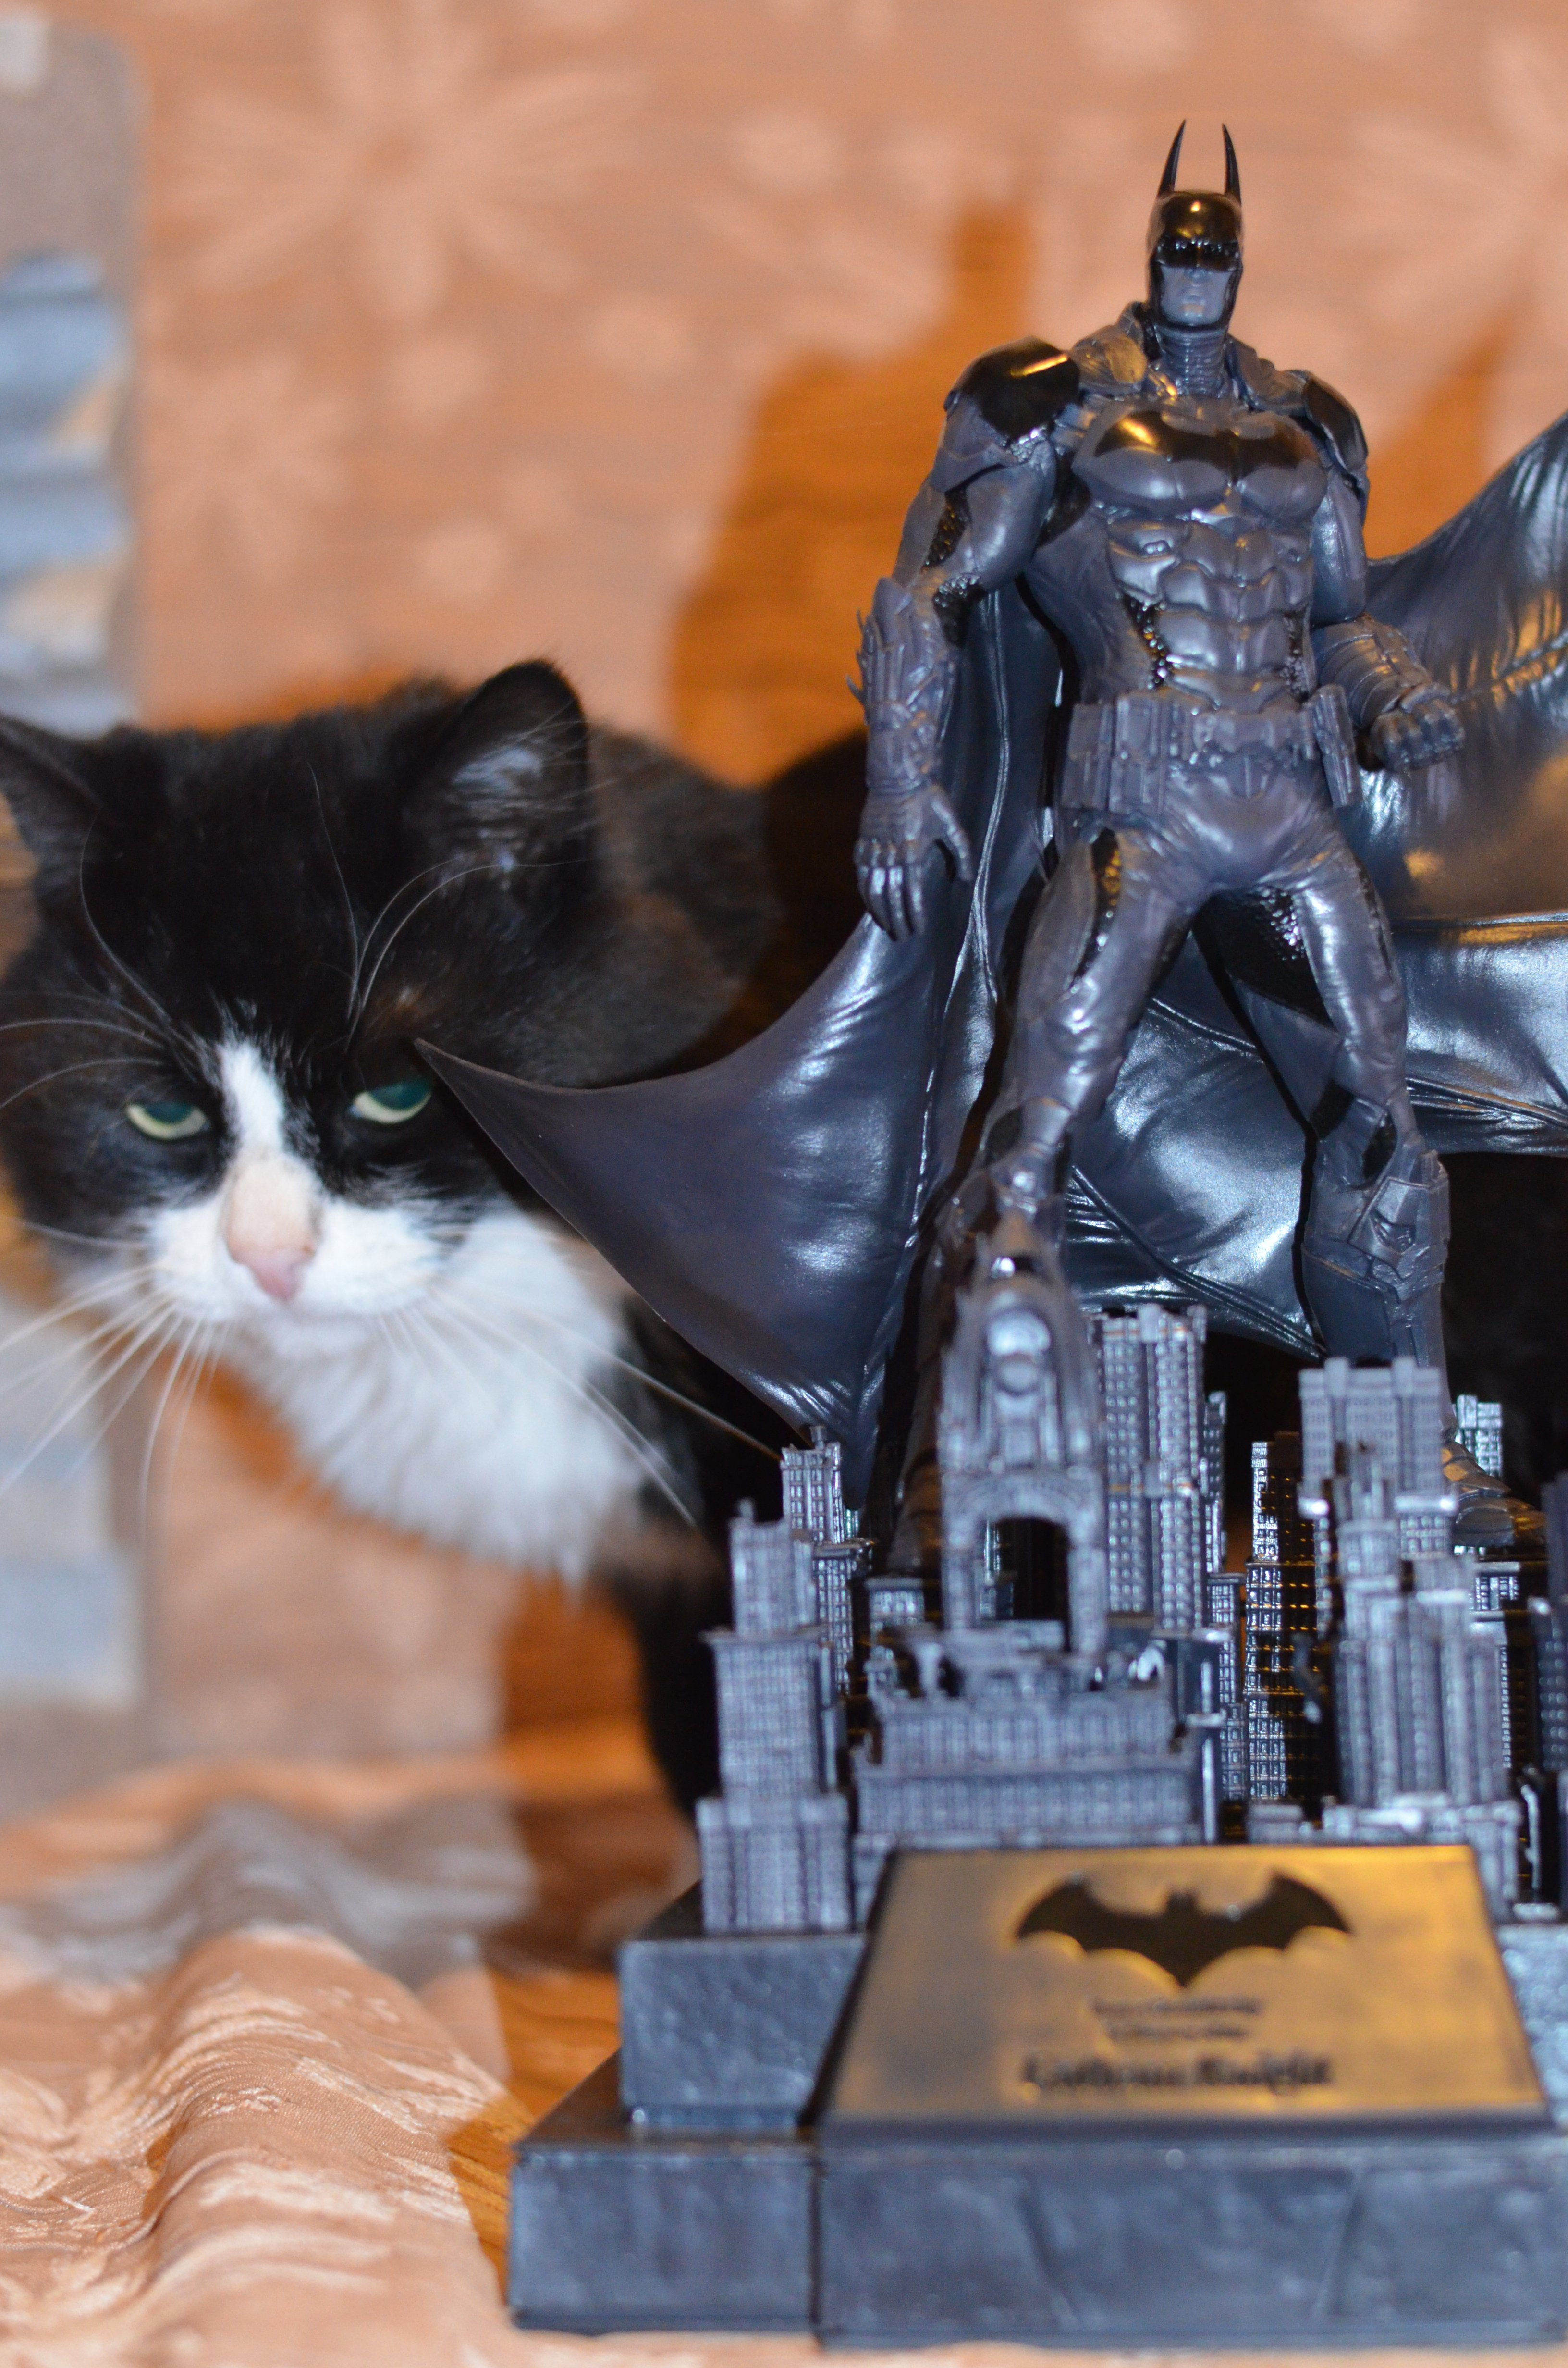 Анбоксинг Batman Arkham Knight limited edition (PS4). - Изображение 37